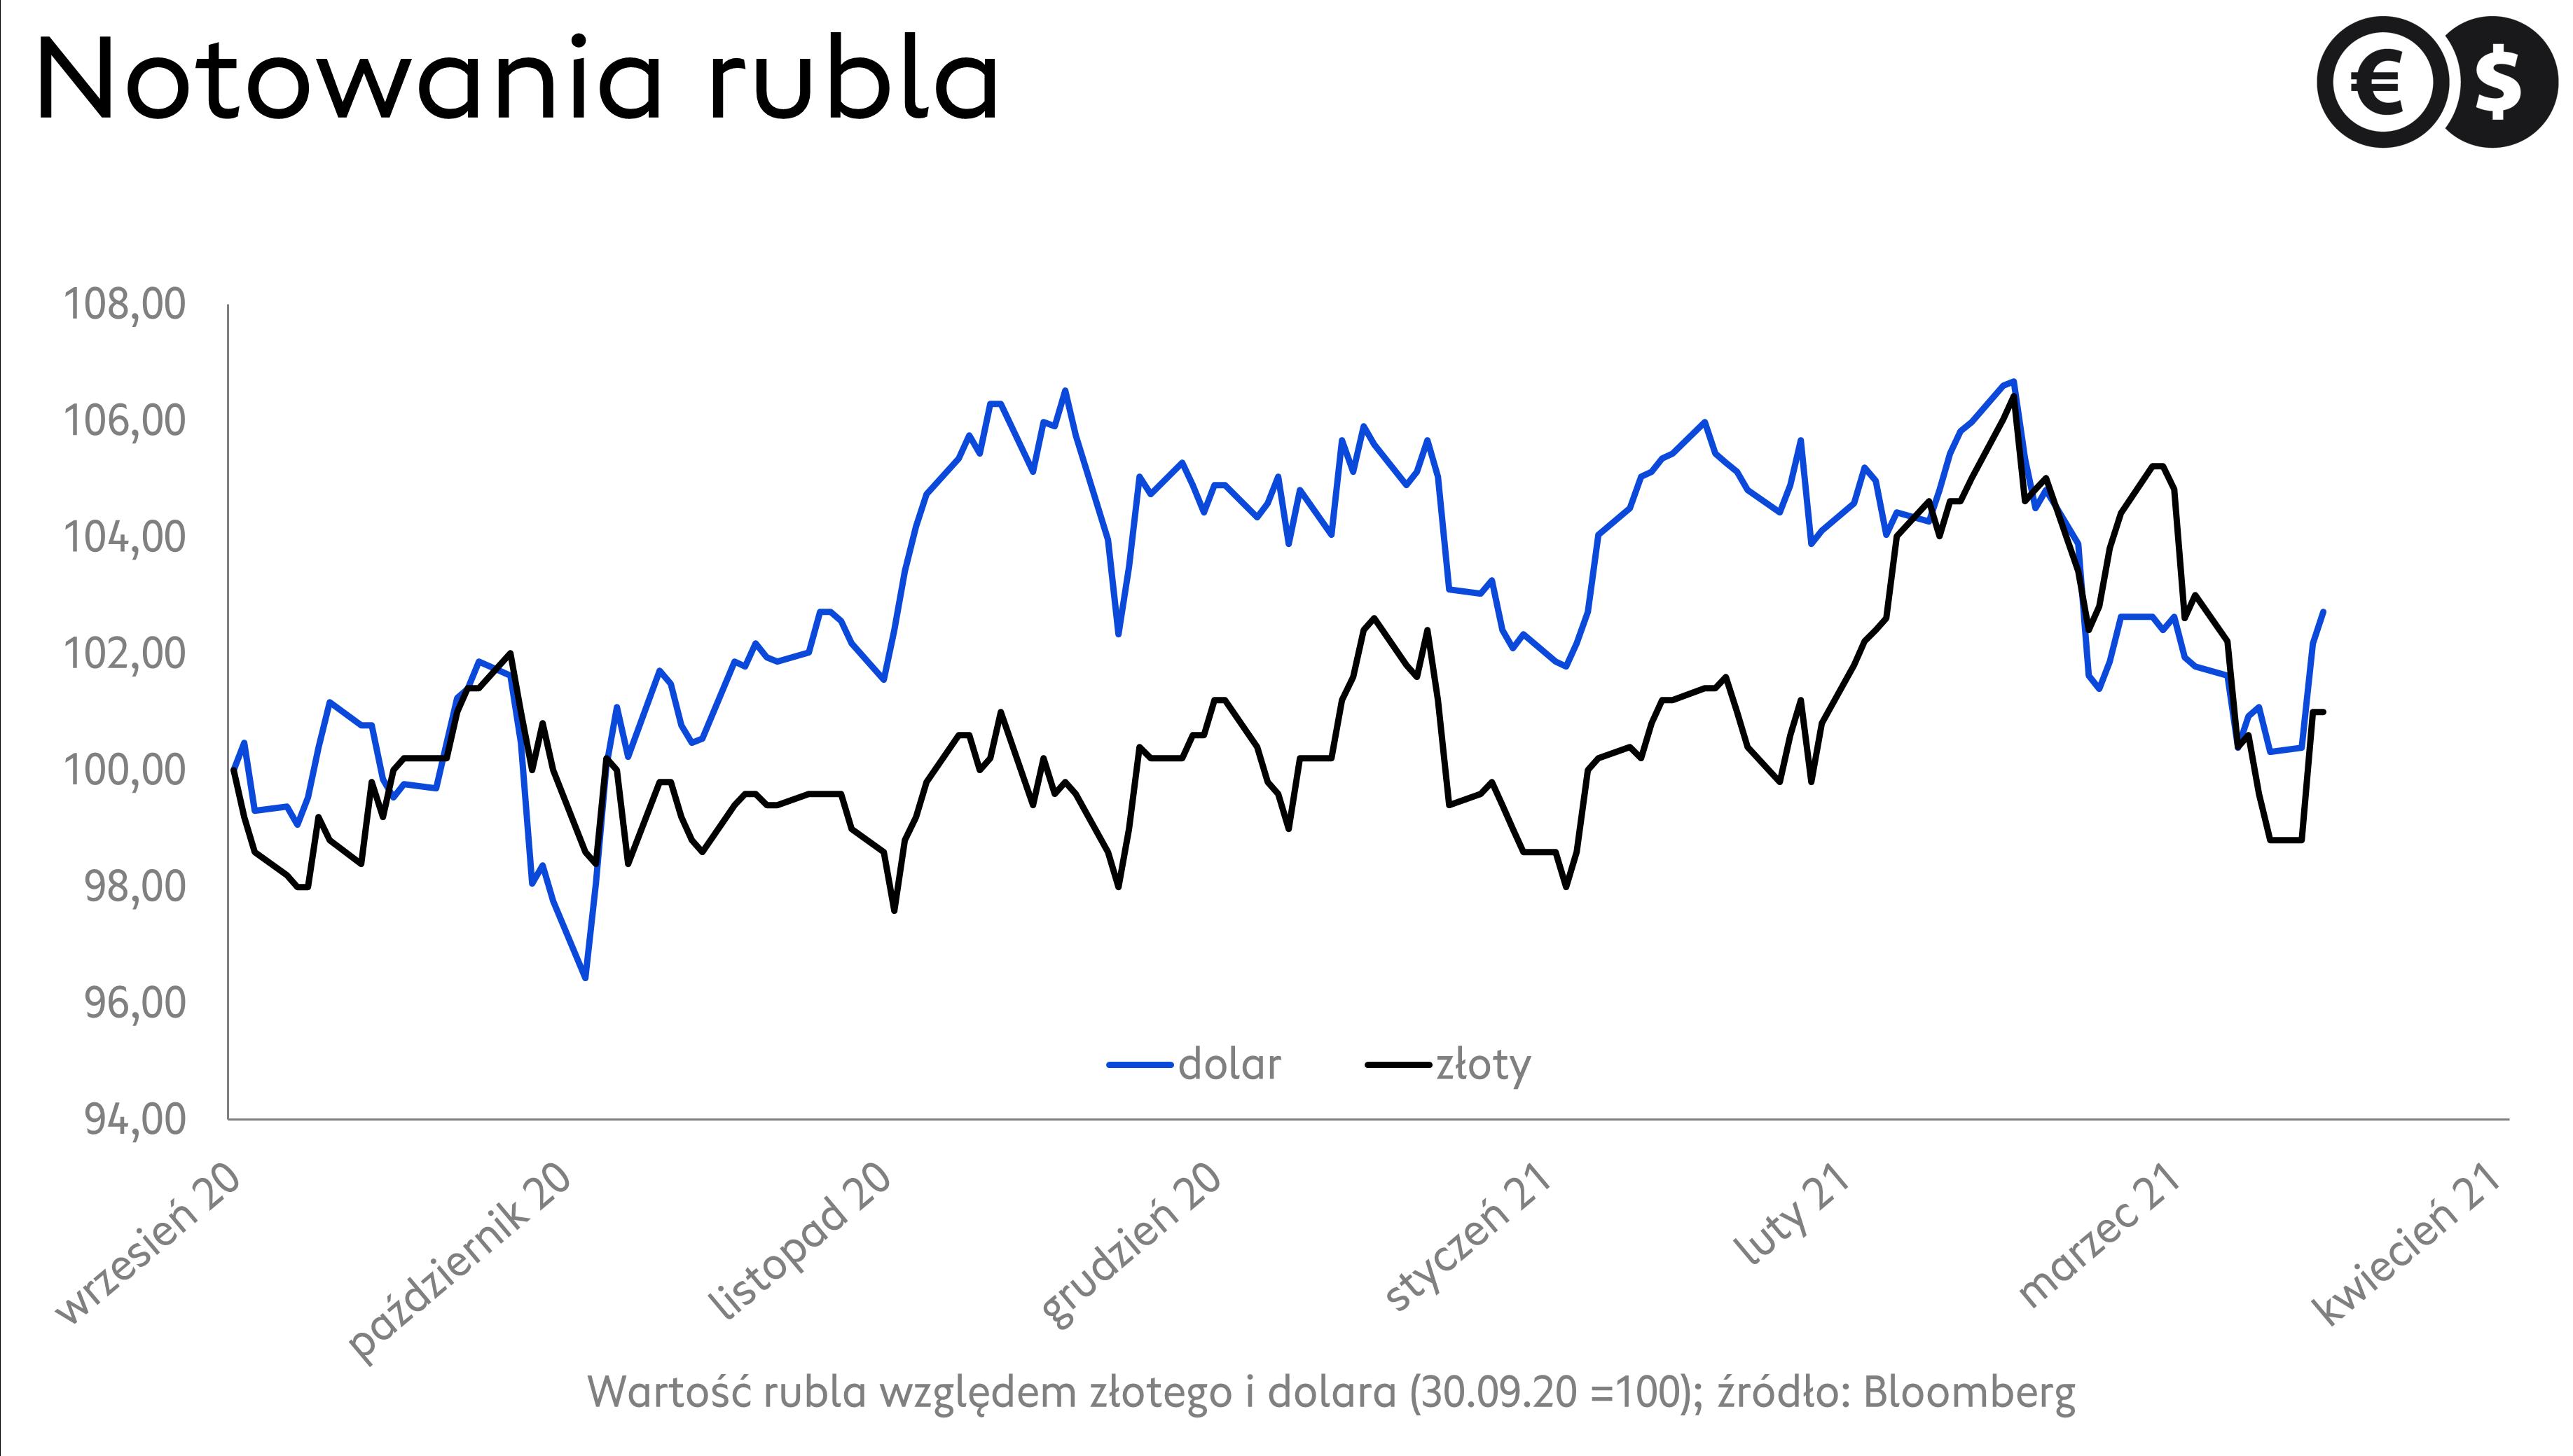 Kurs rubla, wykres USD/RUB i RUB/PLN; źródło: Bloomberg